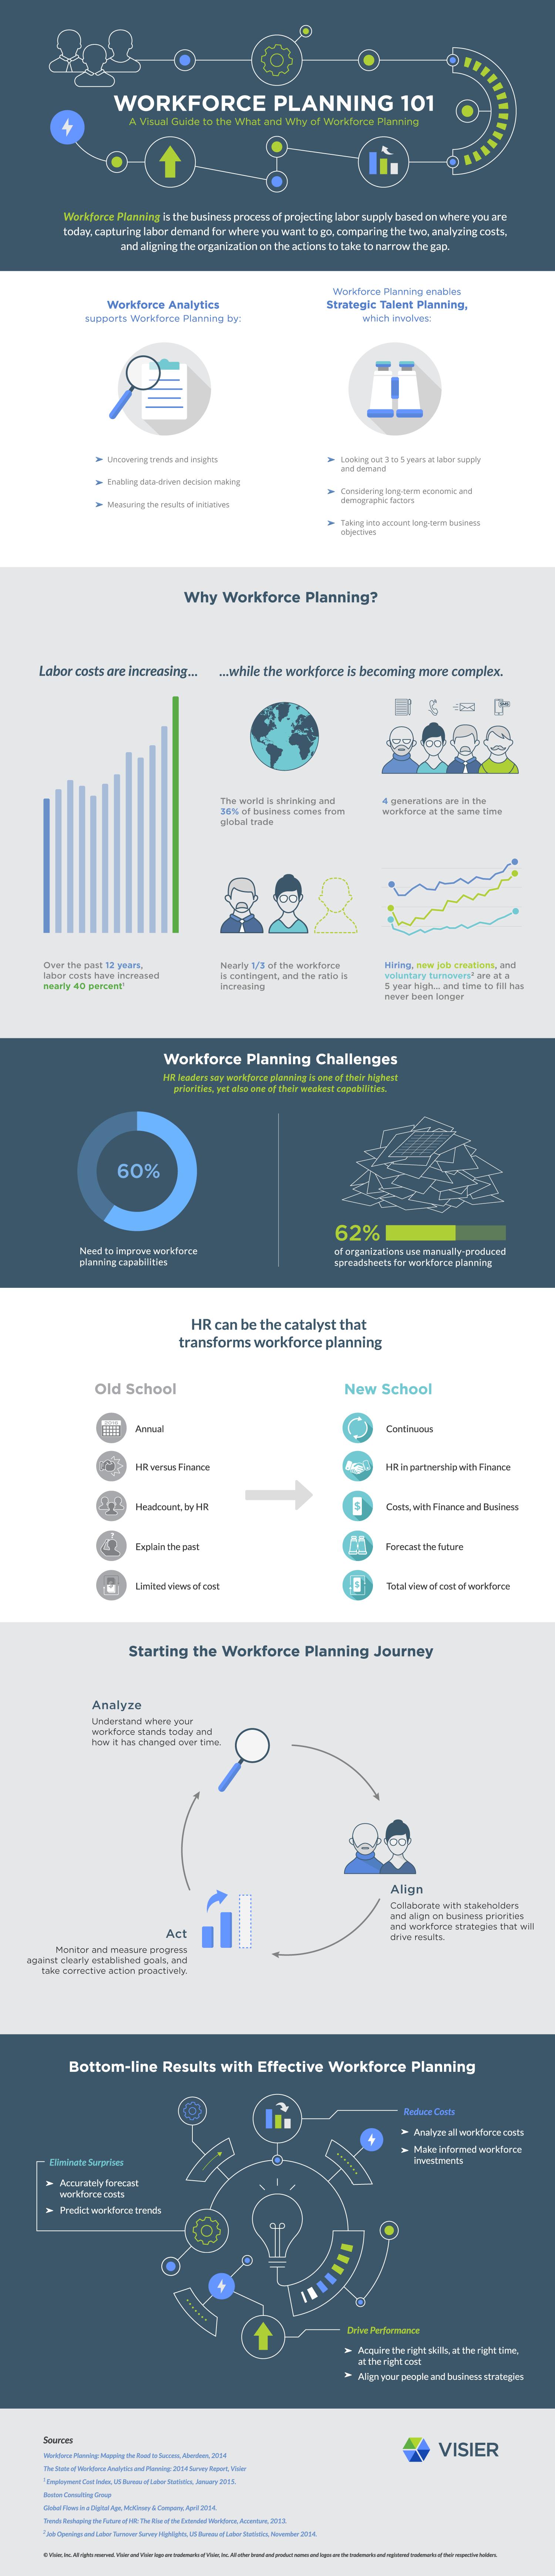 Visier Workforce Planning 101